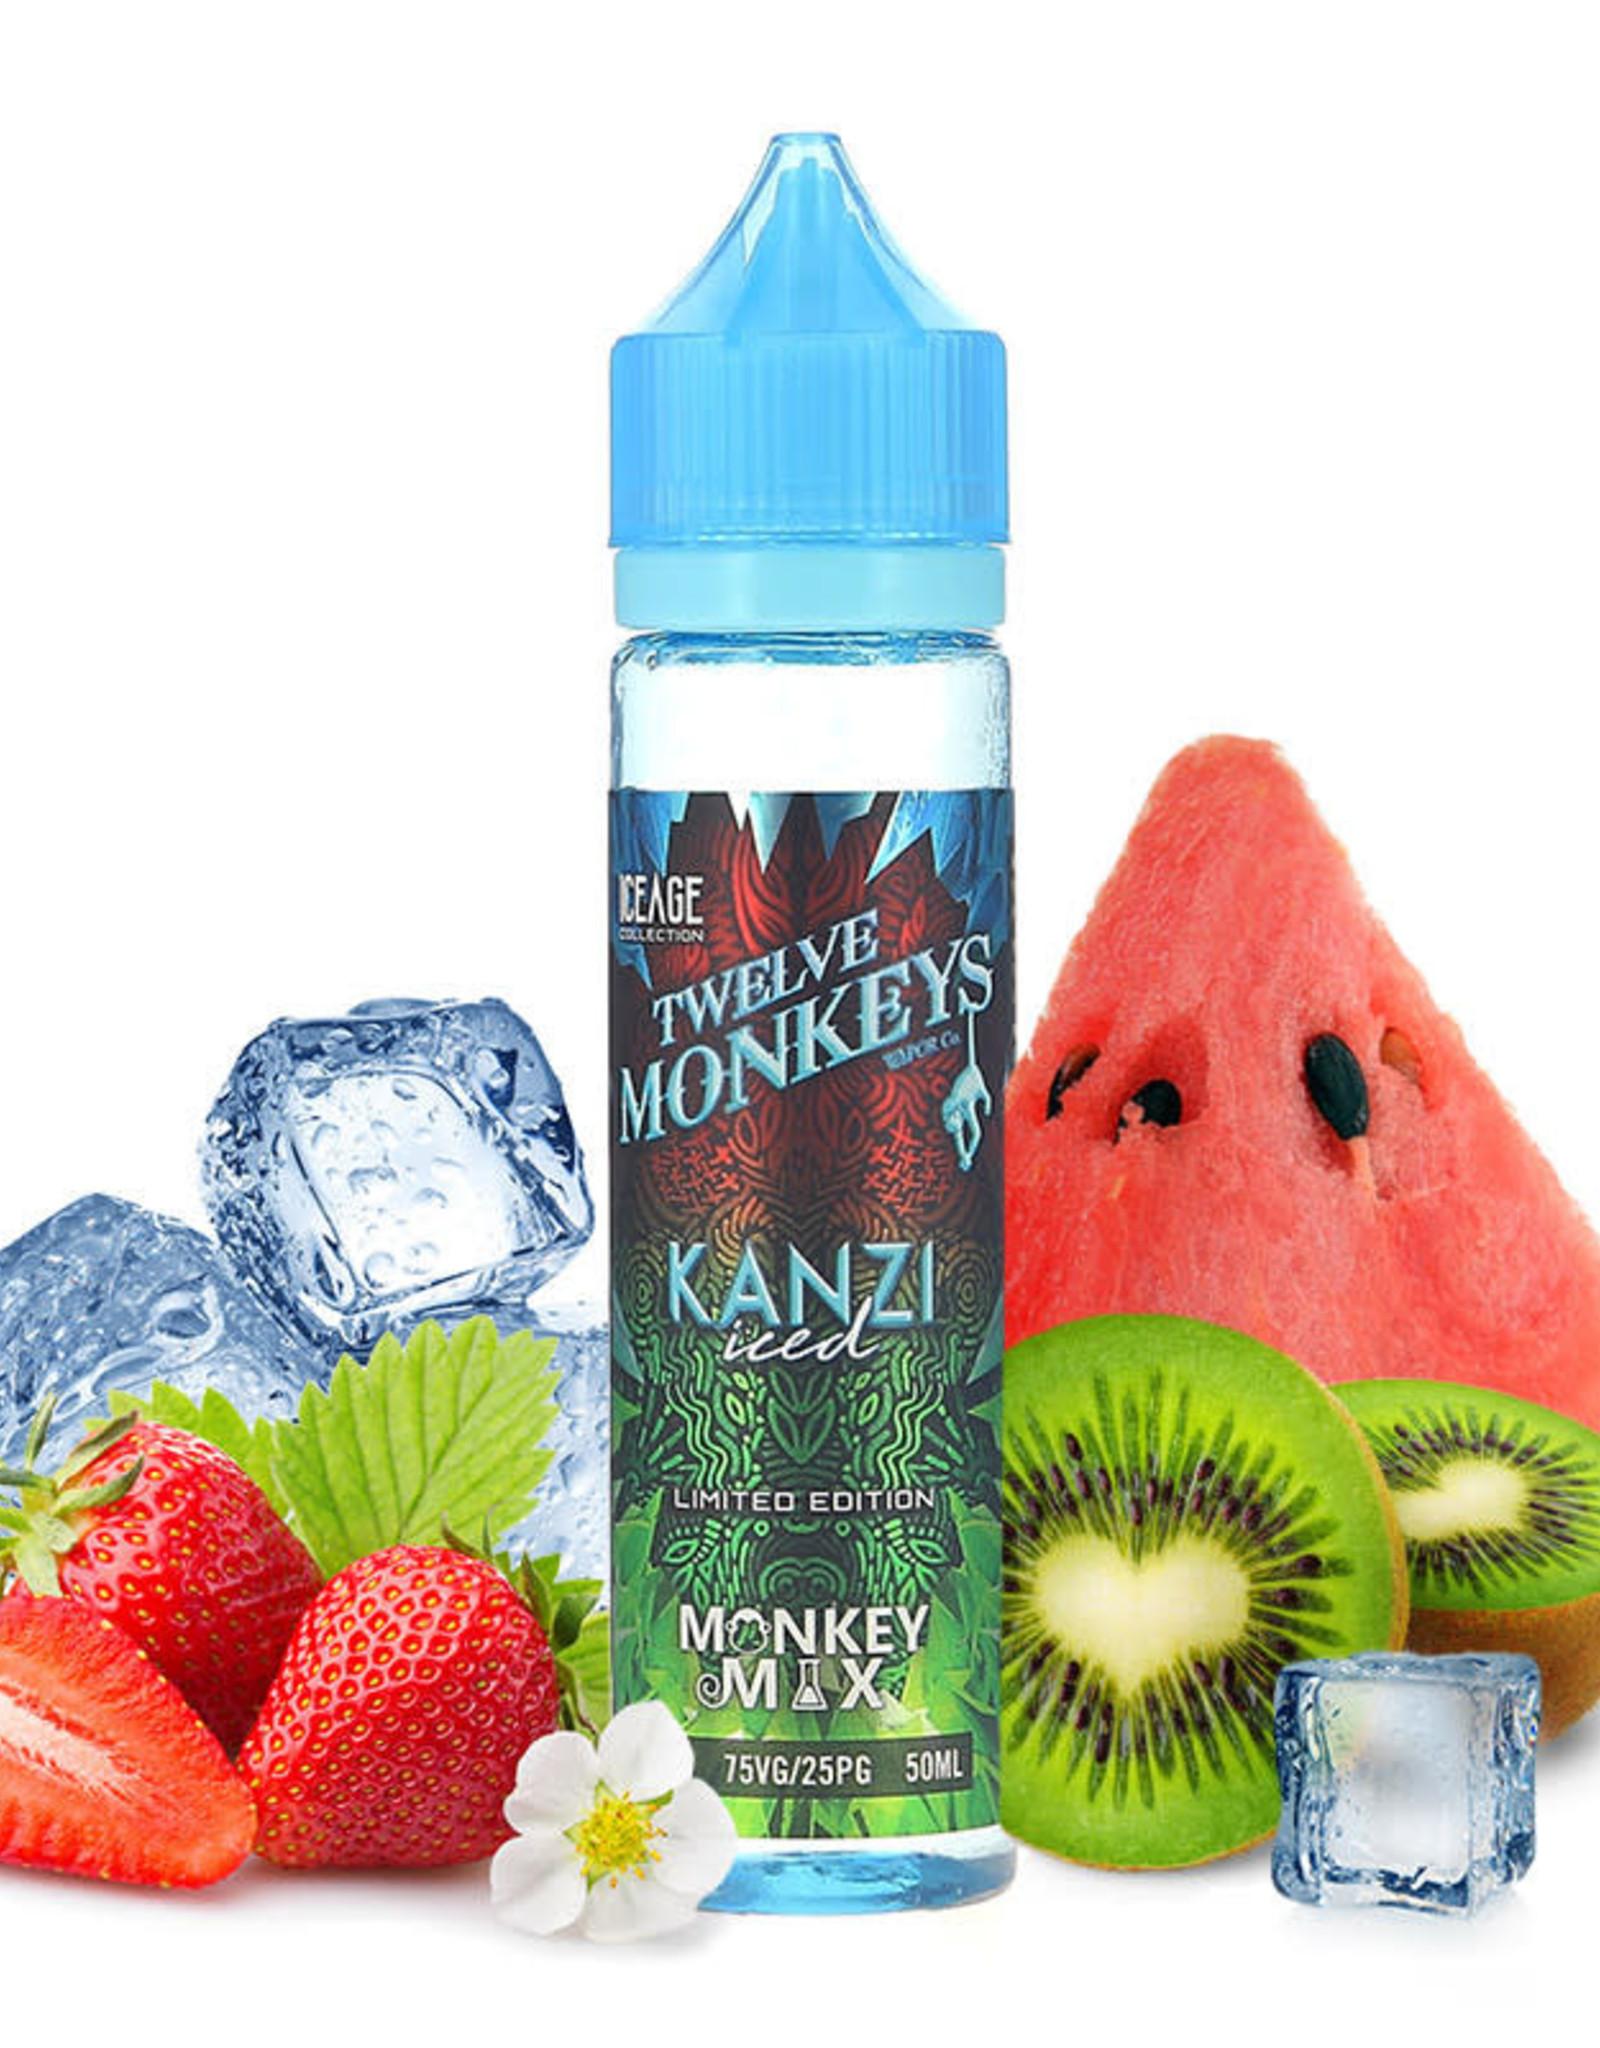 12 Monkeys Twelve Monkeys - Kanzi Iced 50ml